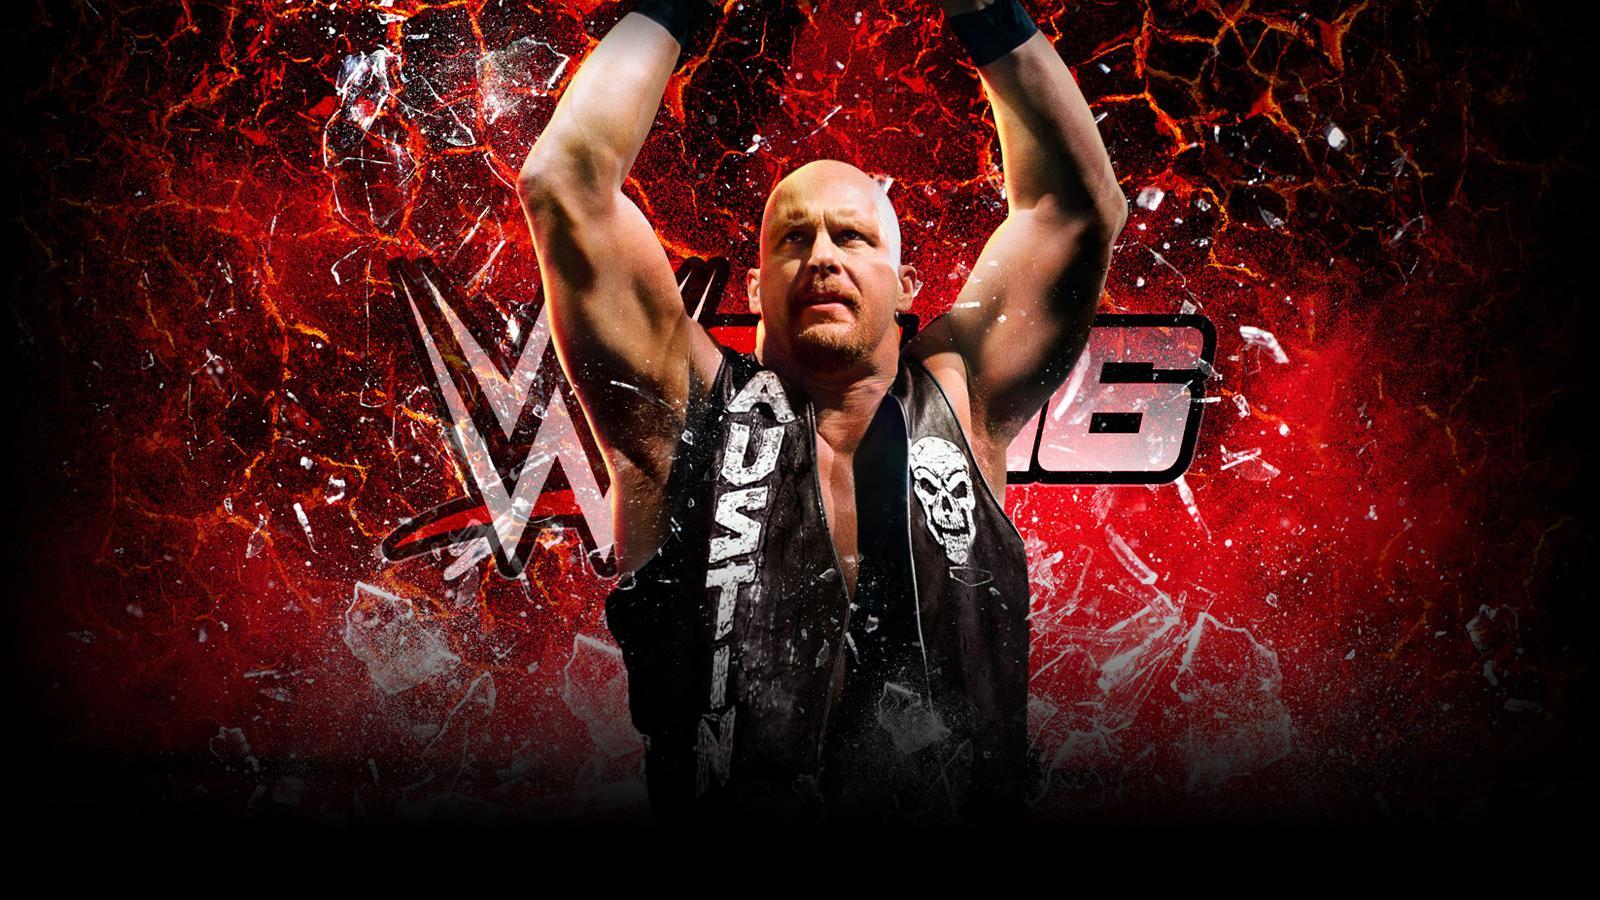 WWE2K16 Wallpaper StoneCold